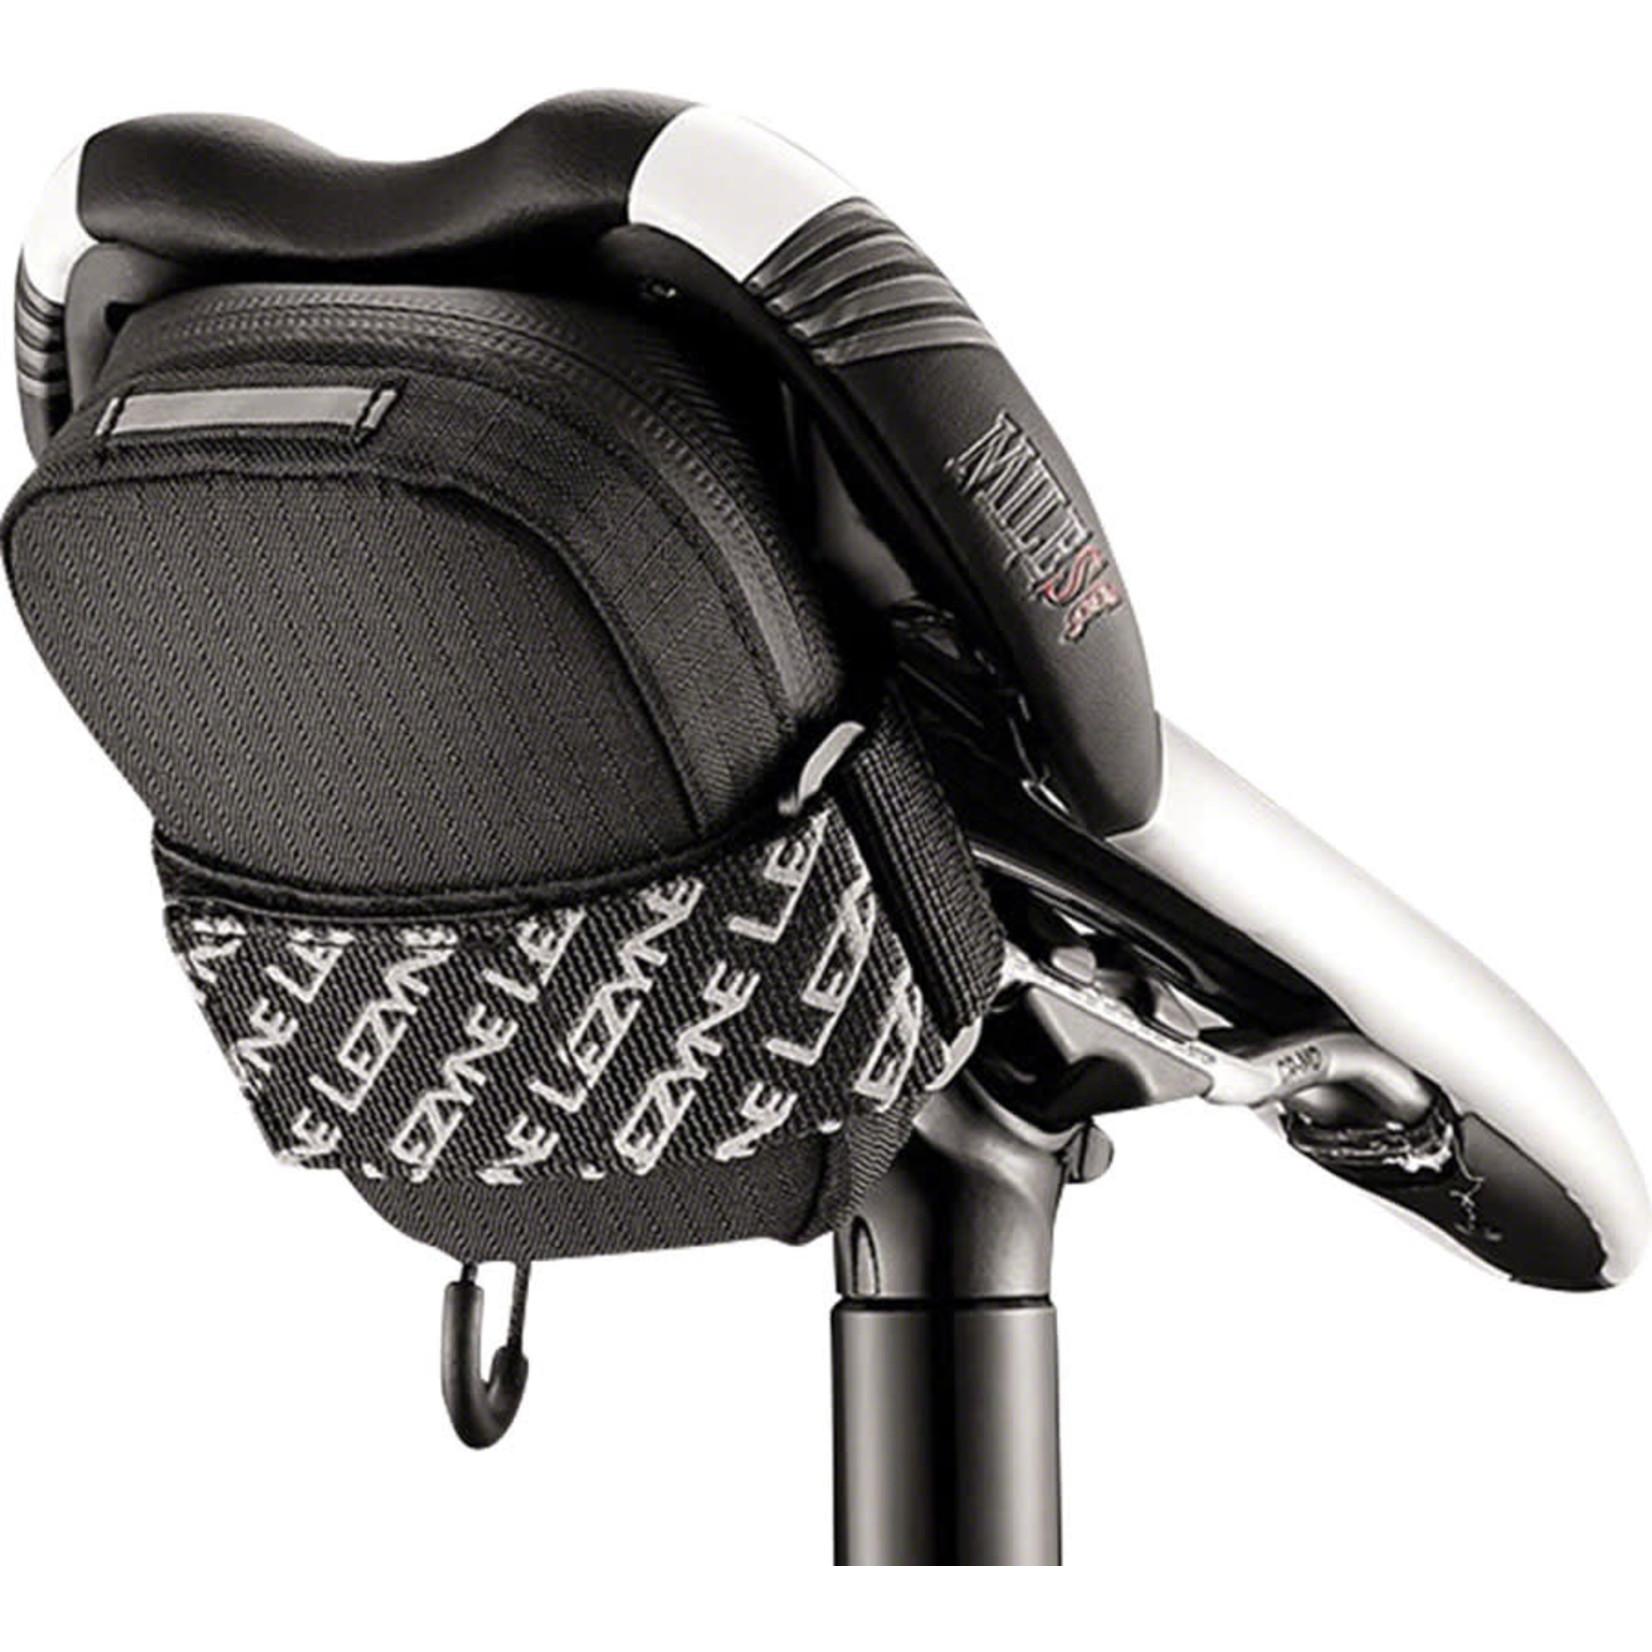 Lezyne Lezyne Road Caddy Saddle Bag Single Strap Compact: Black